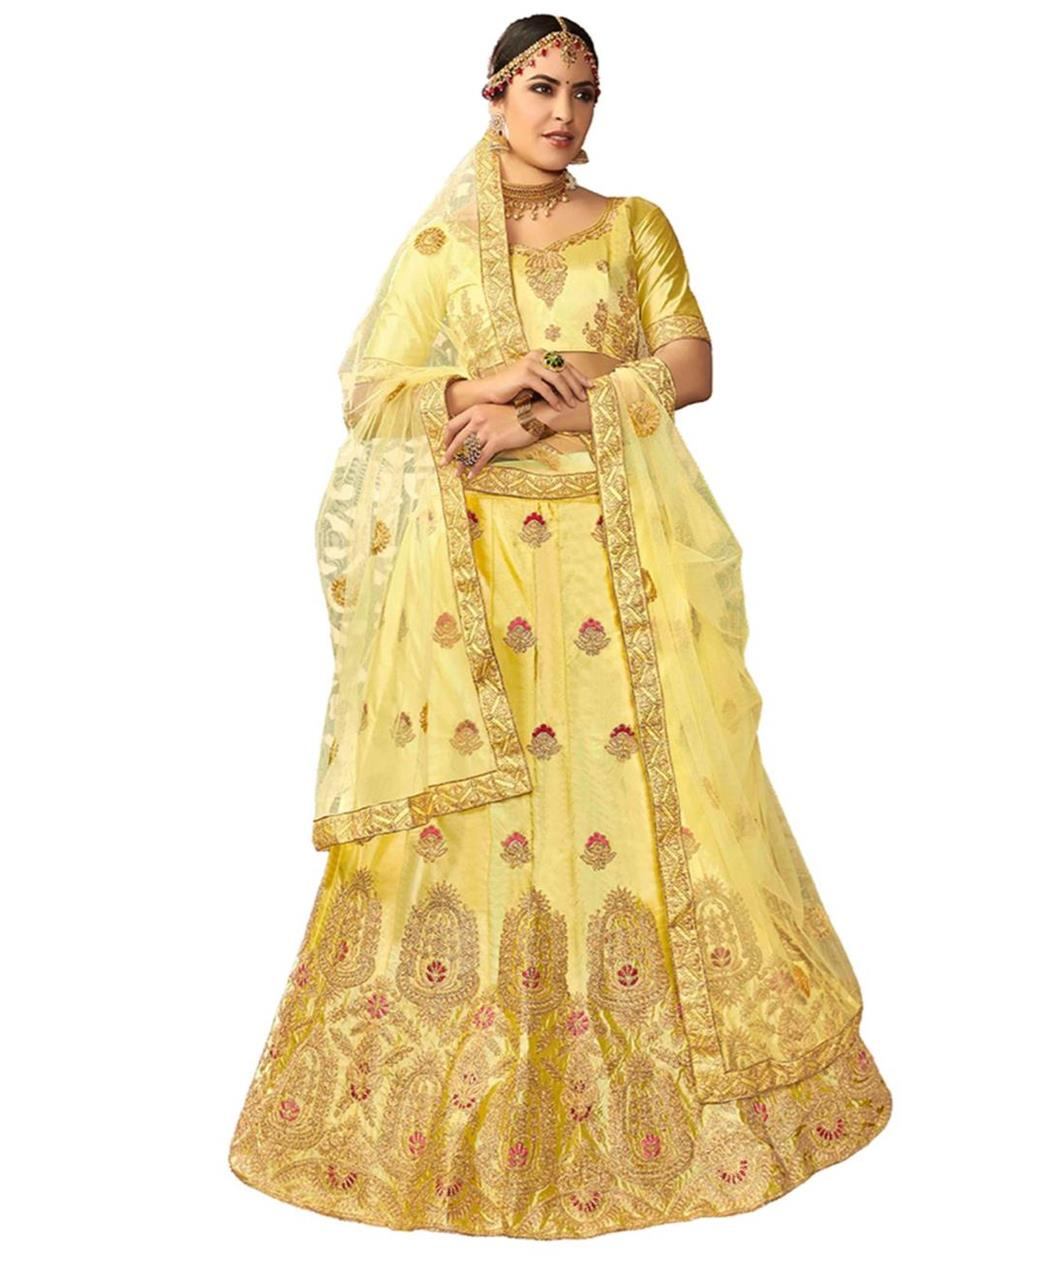 Embroidered Silk Yellow Circular Lehenga Choli Ghagra